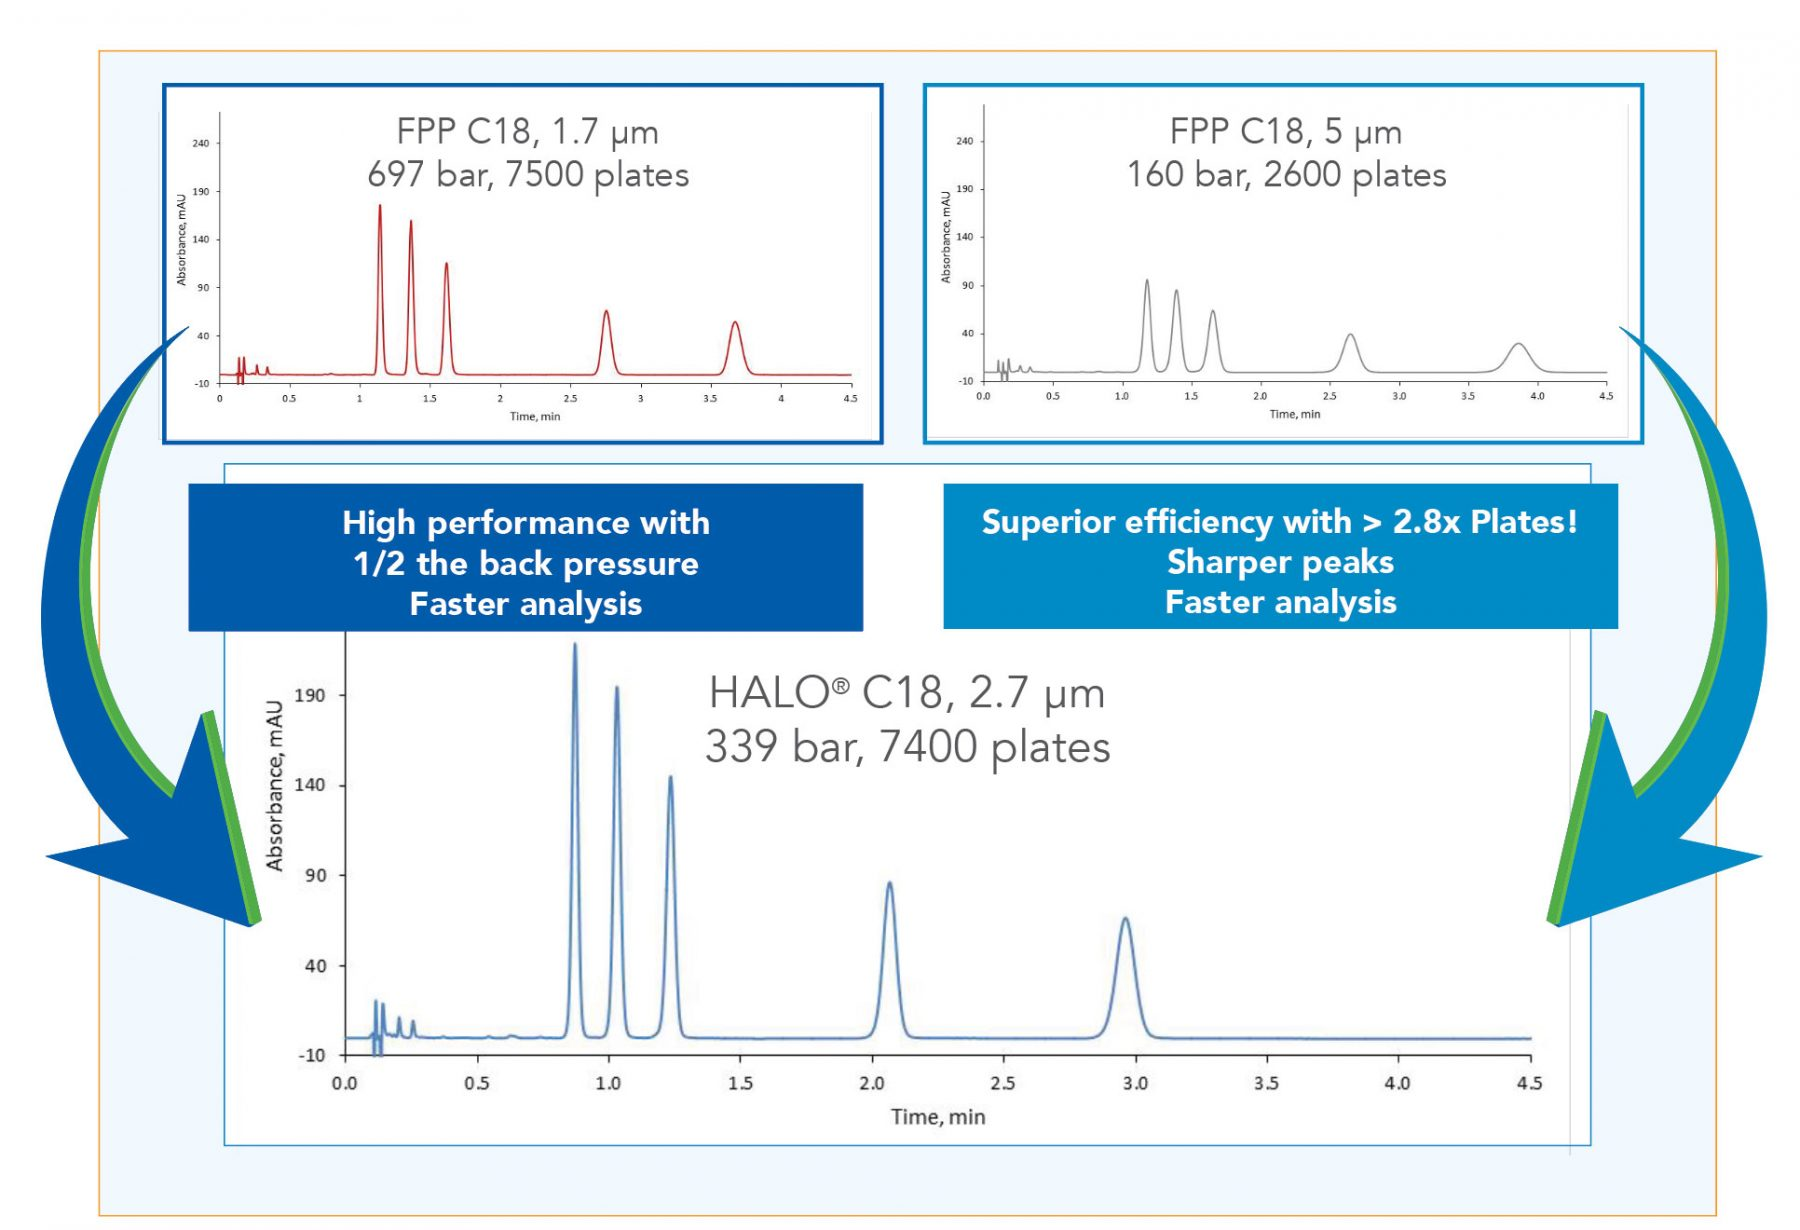 halo c18 column performance - chromatograph of halo vs fpp